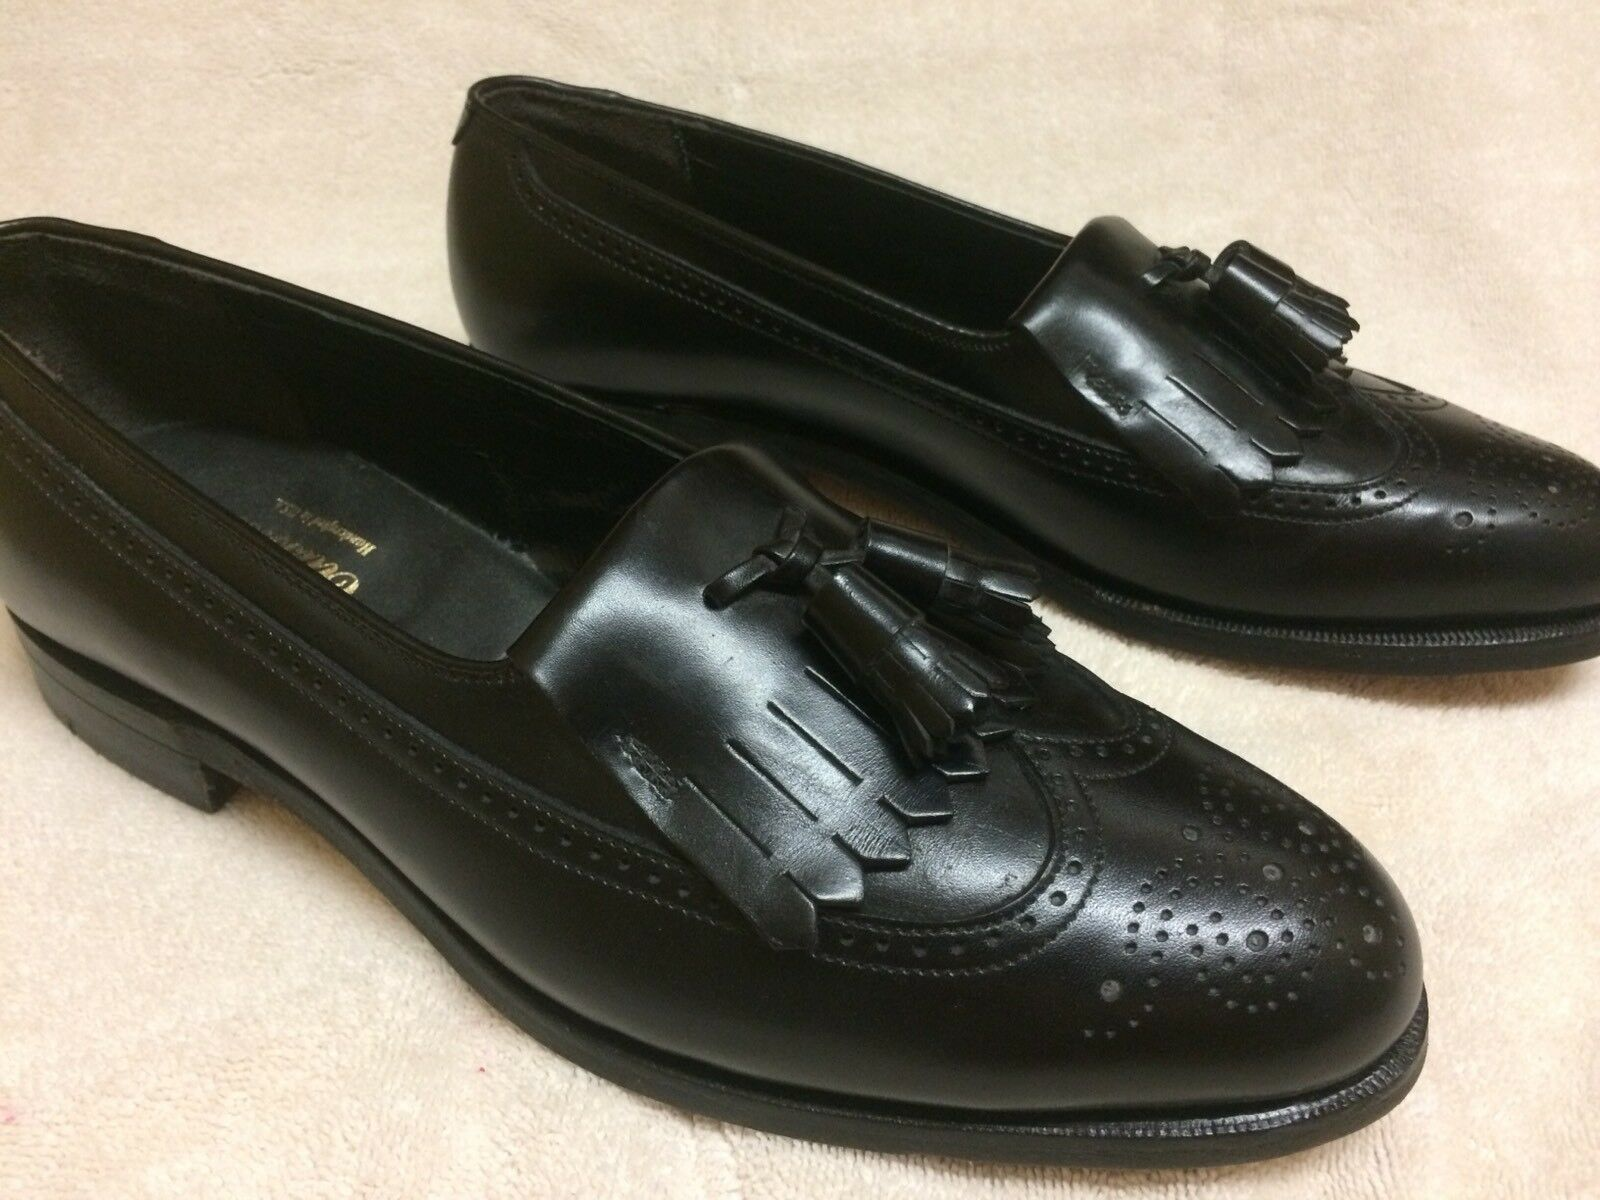 FOOTJOY CLASSICS Loafers - schwarz schwarz schwarz Sz 10.5 A Made in USA Excellent a7768a